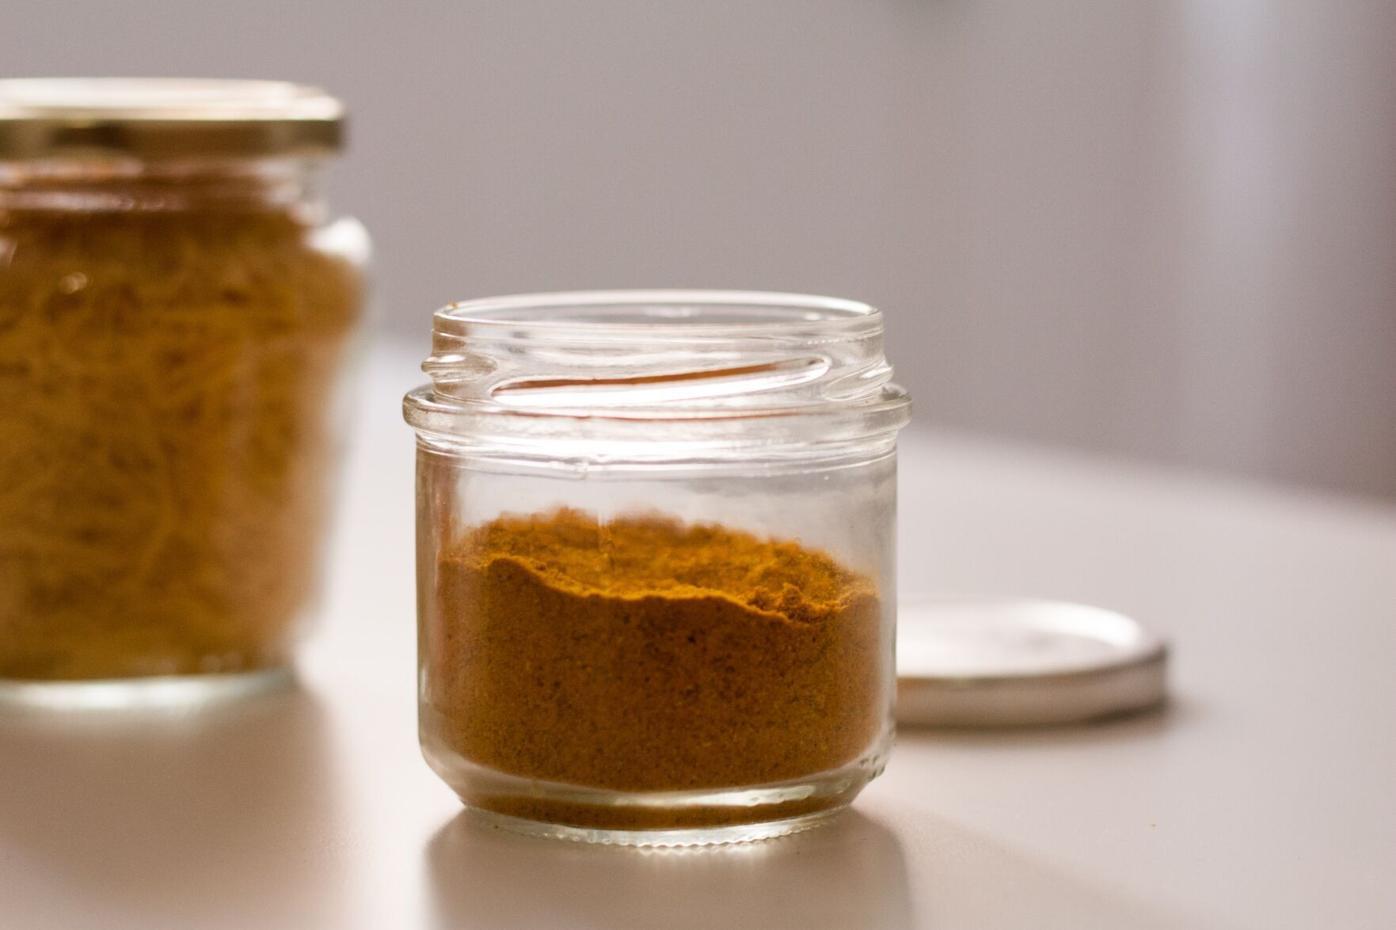 Jar of spice